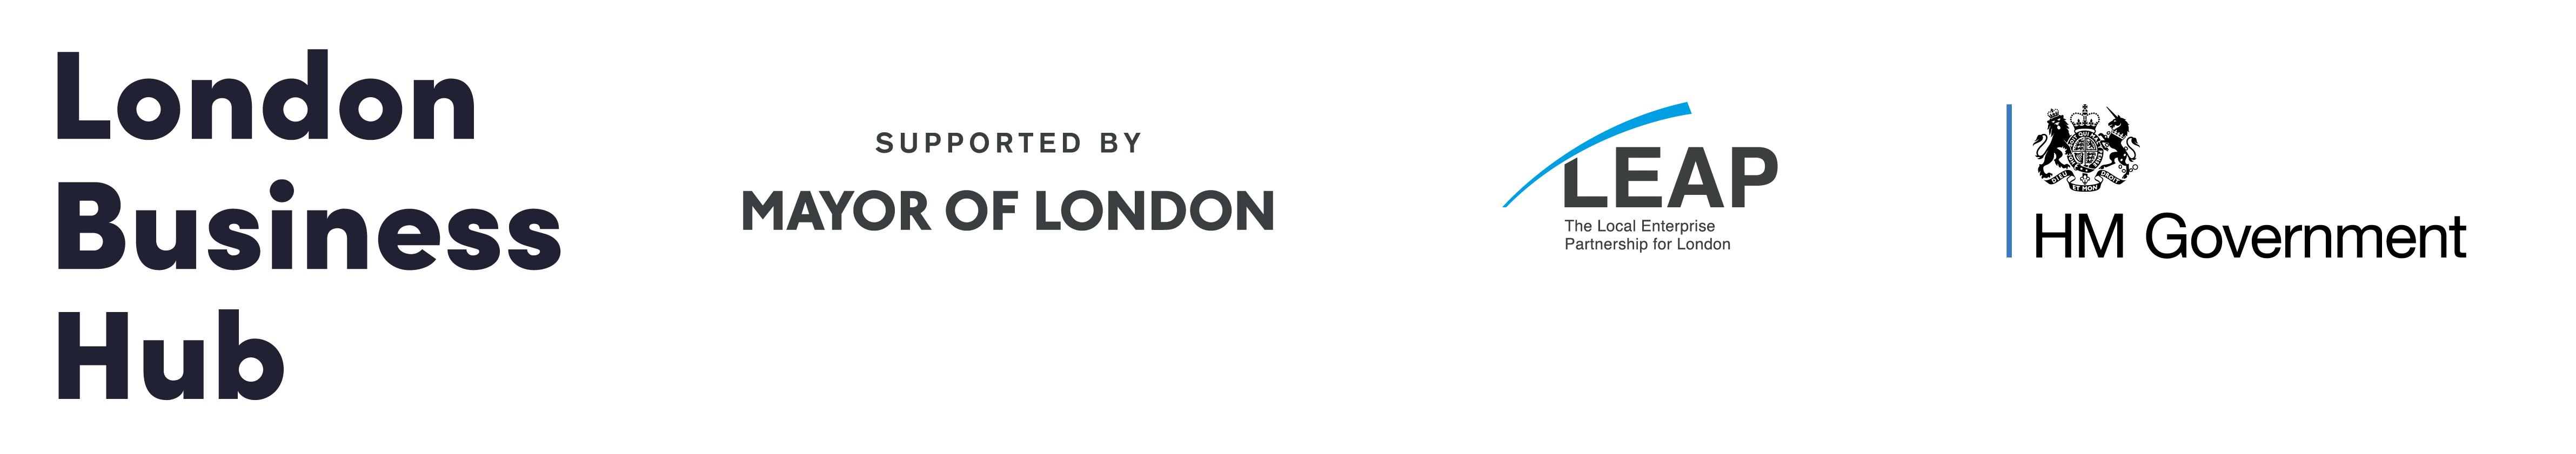 London authority and London business hub logo partners